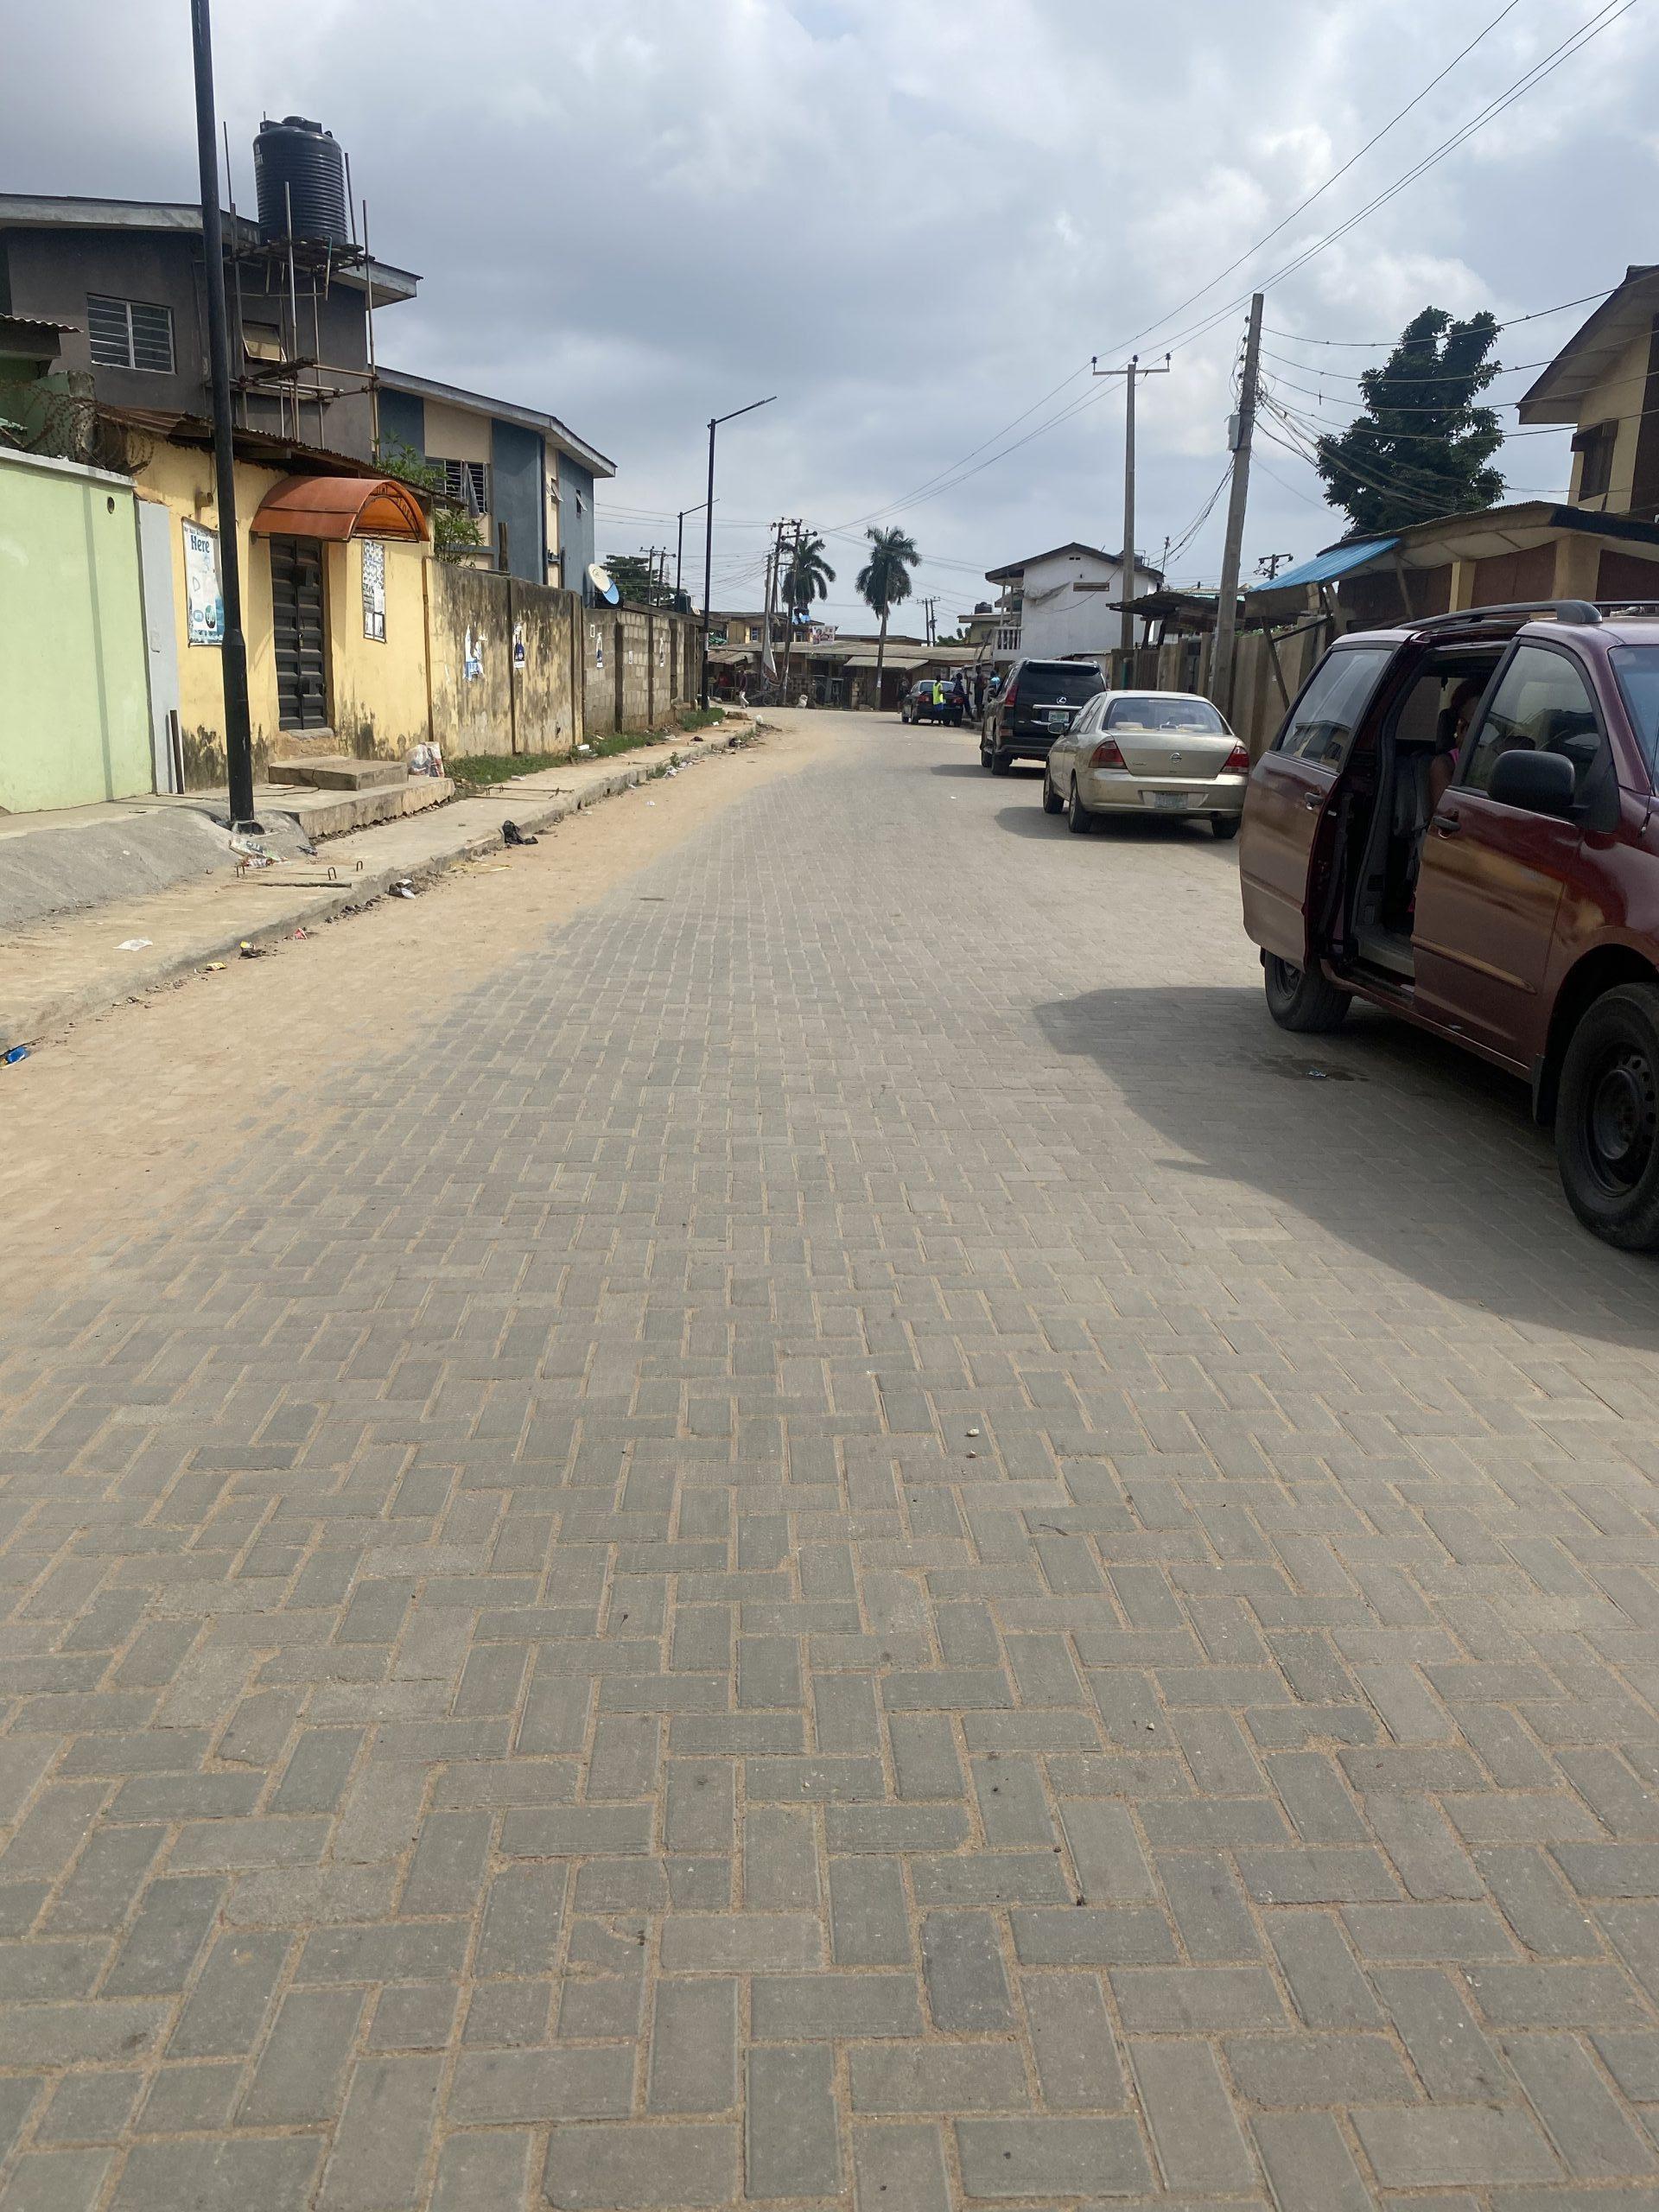 Deserted street at Along Ifesowapo, Ojodu LCDA